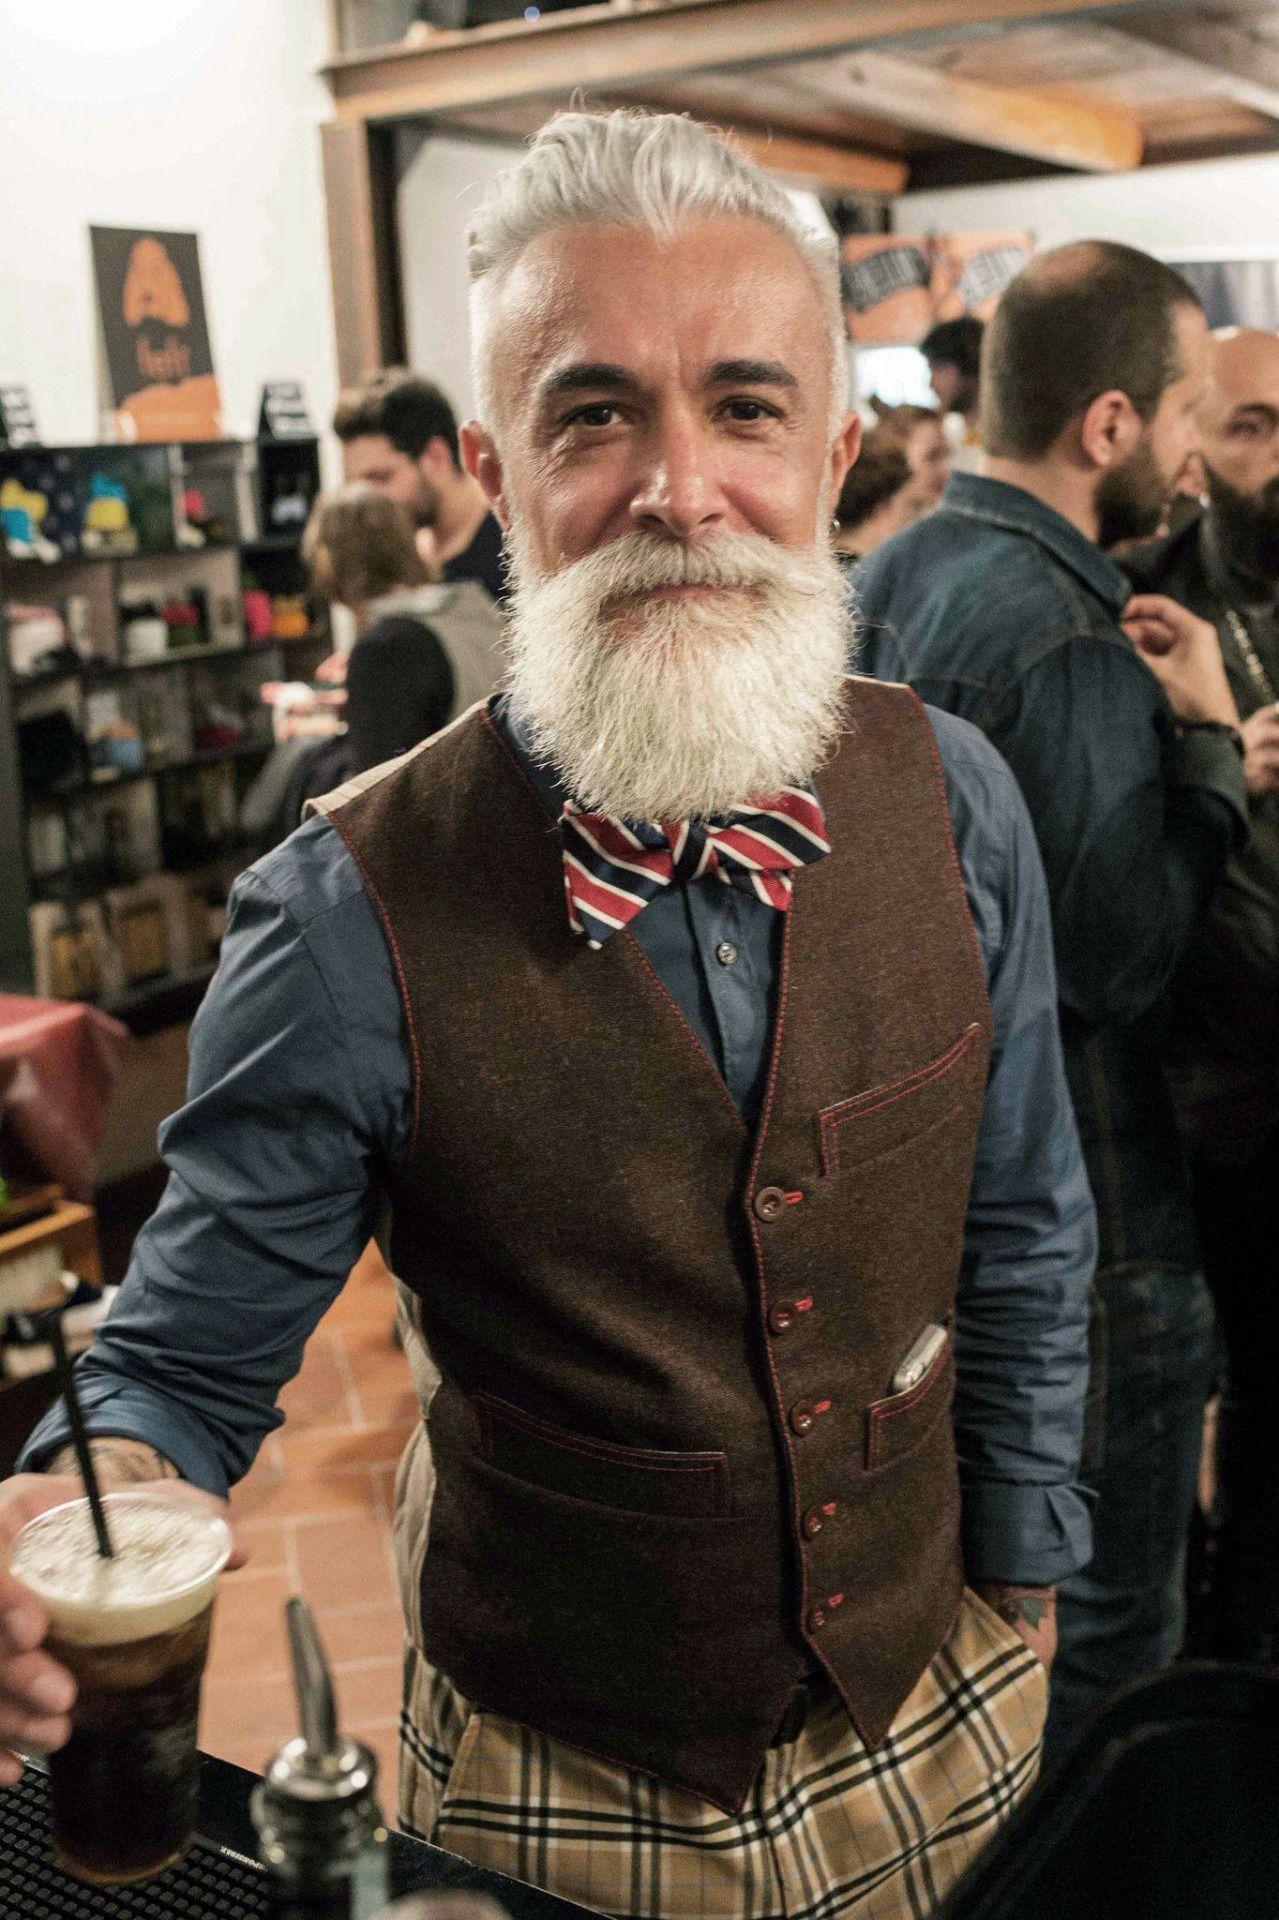 Resultat De Recherche D Images Pour Alessandro Manfredini Hipster Mens Fashion Older Mens Fashion Hipster Fashion